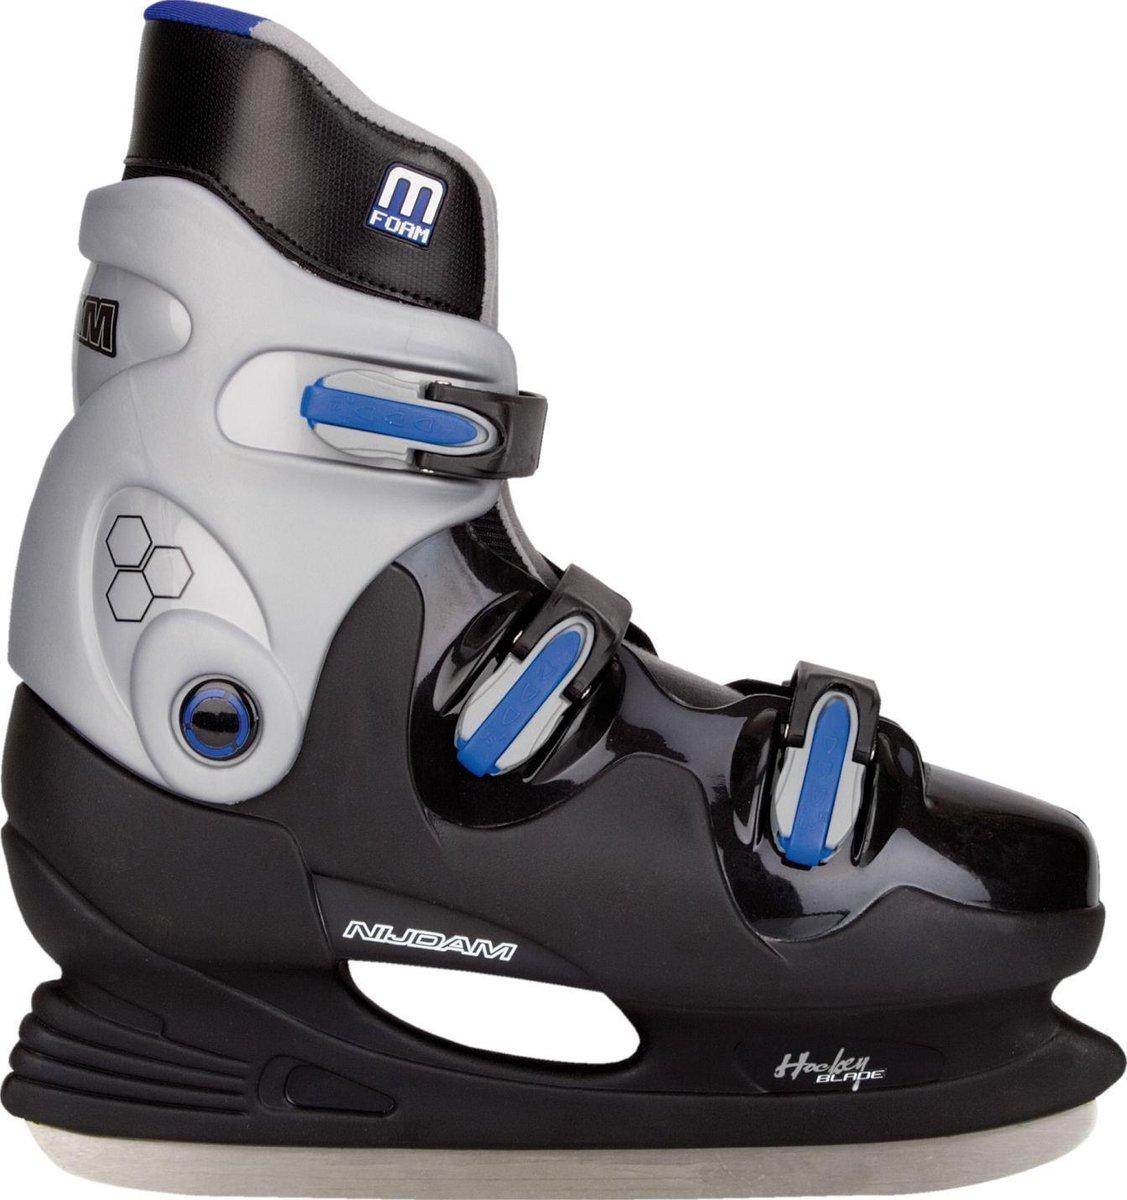 Nijdam IJshockeyschaats - Hardboot - Zwart/Blauw - Maat 36